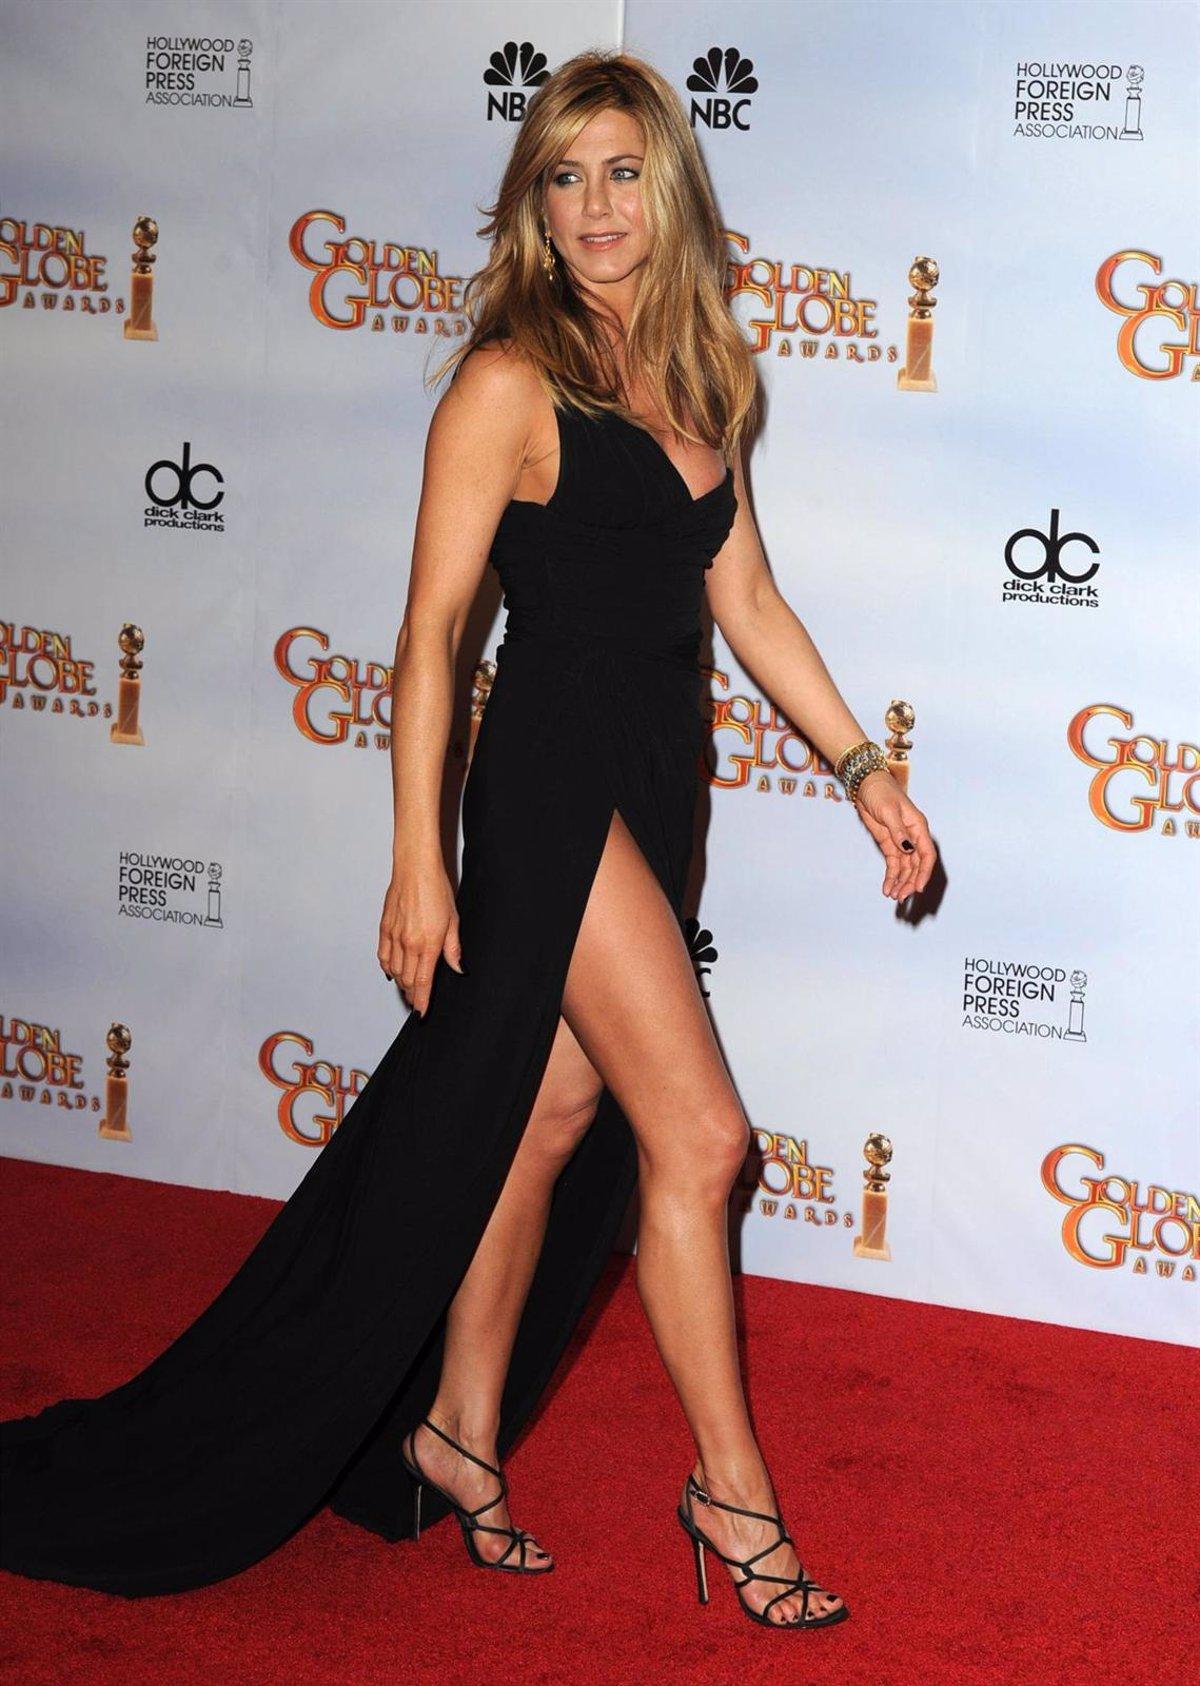 Jennifer Aniston Desnuda Y Comiendo Un Plátano